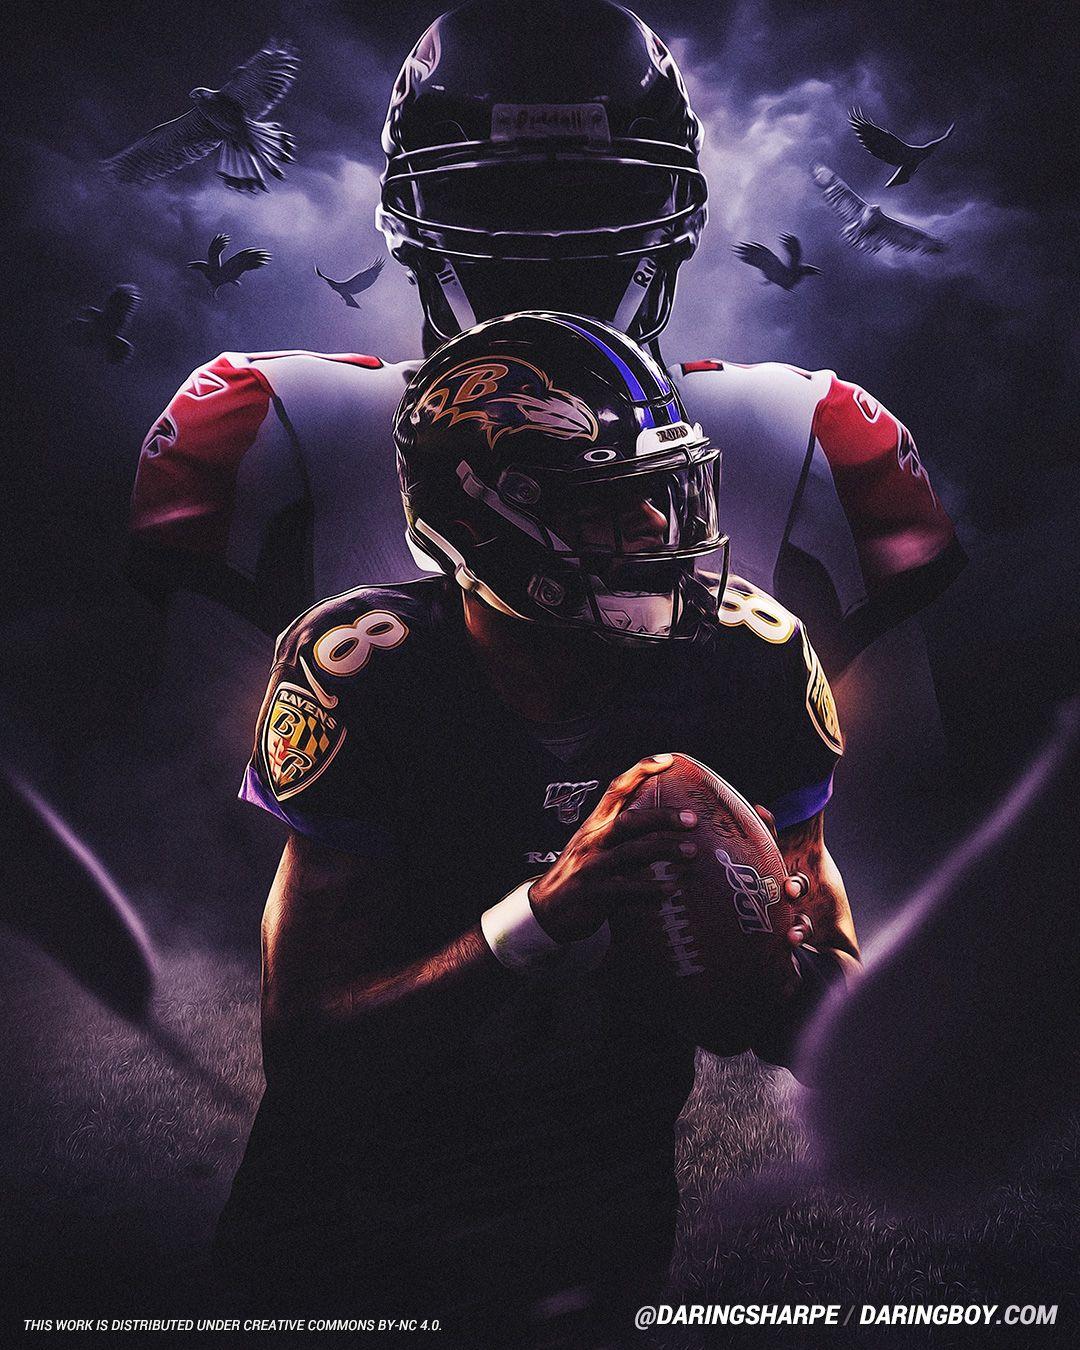 Lamar Jackson Michael Vick Baltimore Ravens Atlanta Falcons In 2020 Michael Vick Lamar Jackson Baltimore Ravens Football